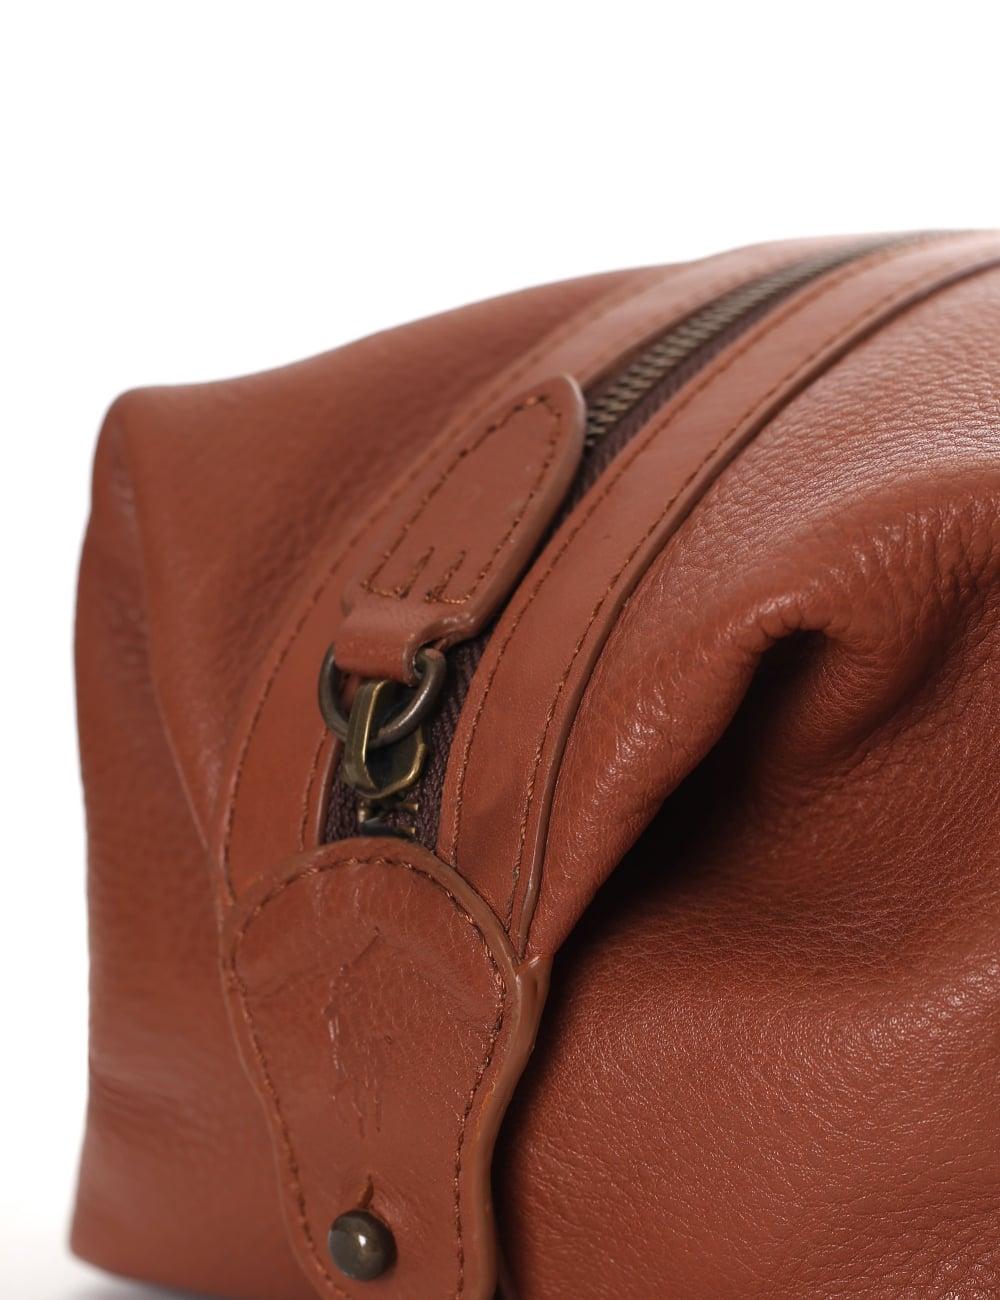 99ccb20a592 Ralph Lauren Mens Leather Travel Bag   ReGreen Springfield